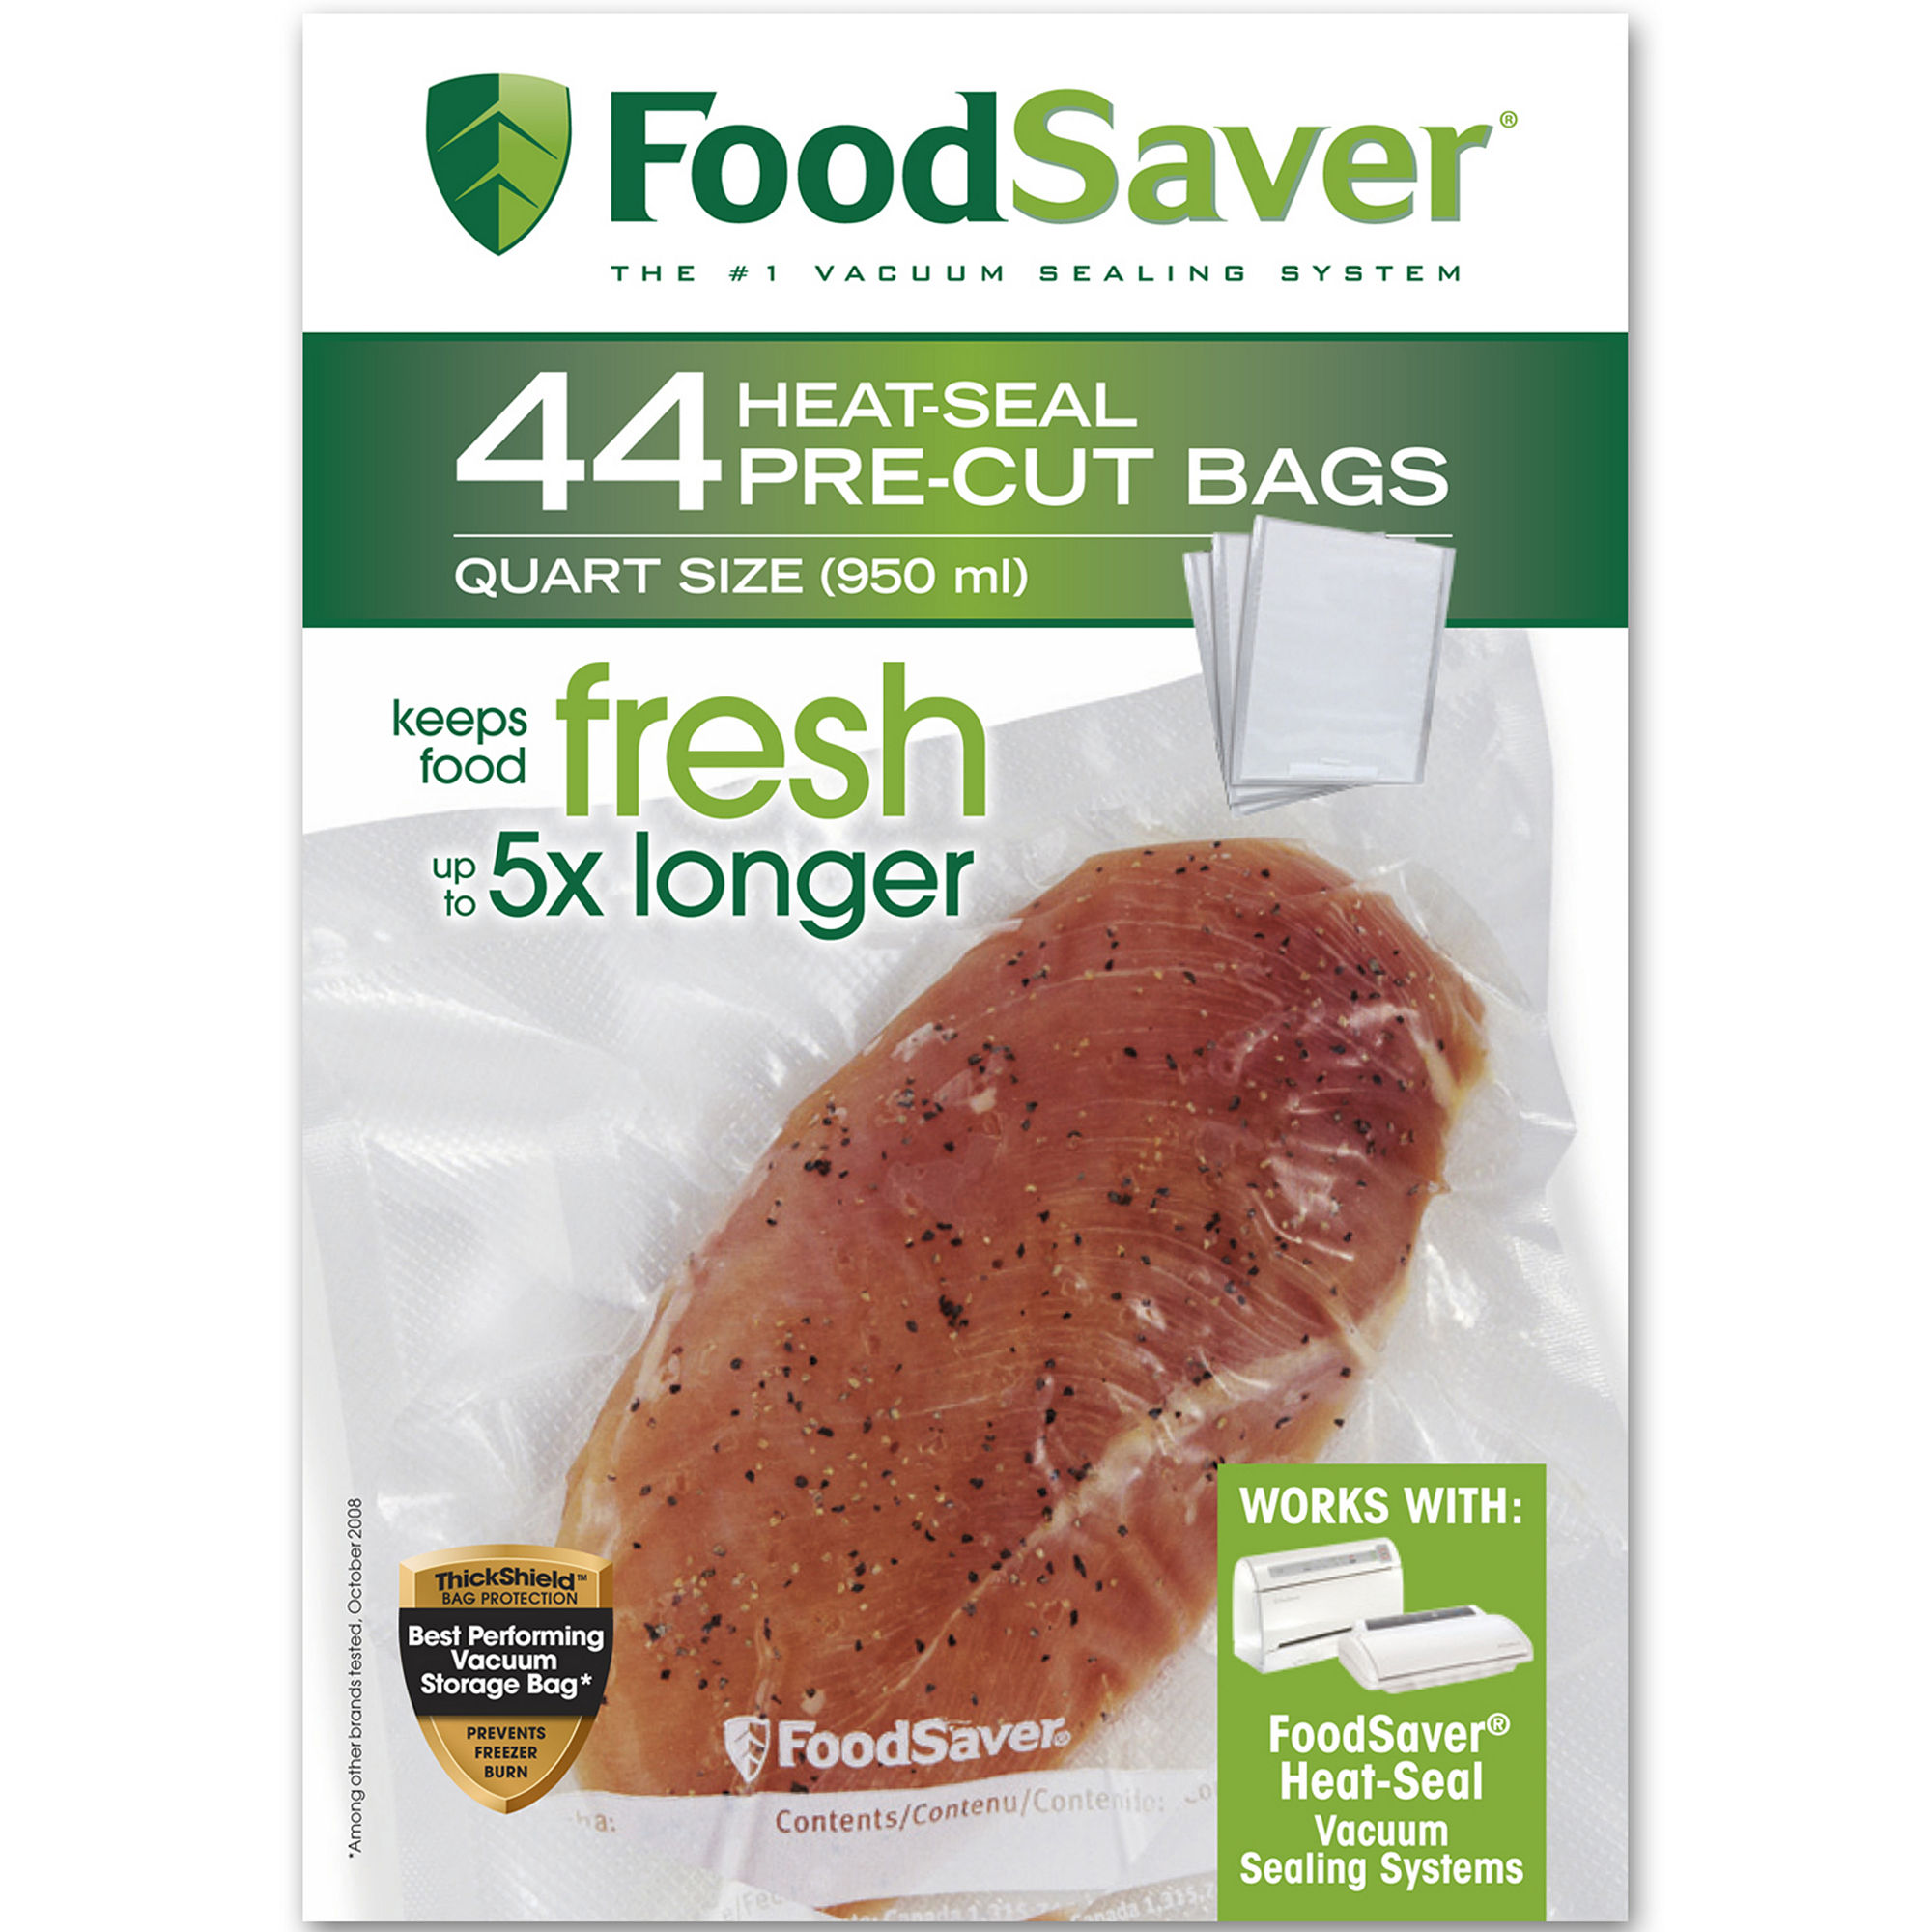 FoodSaver 44 Quart-Size Bags